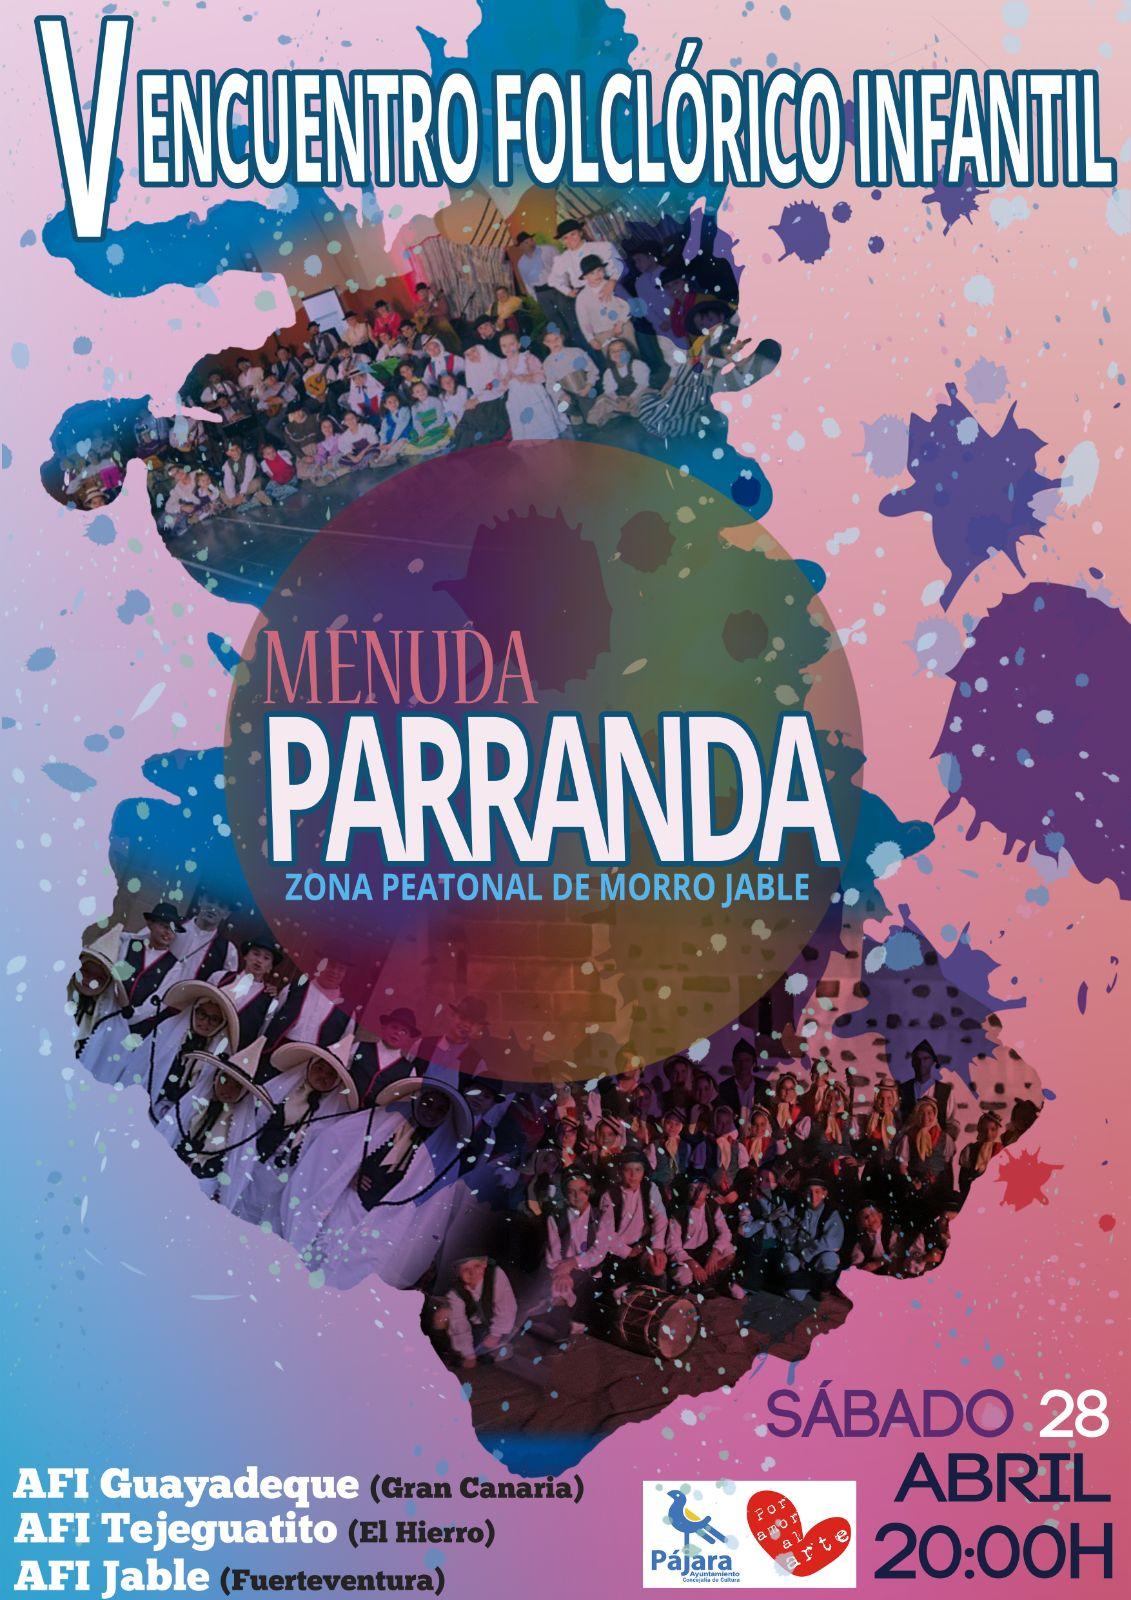 V ENCUENTRO FOLCLÓRICO INFANTIL MENUDA PARRANDA